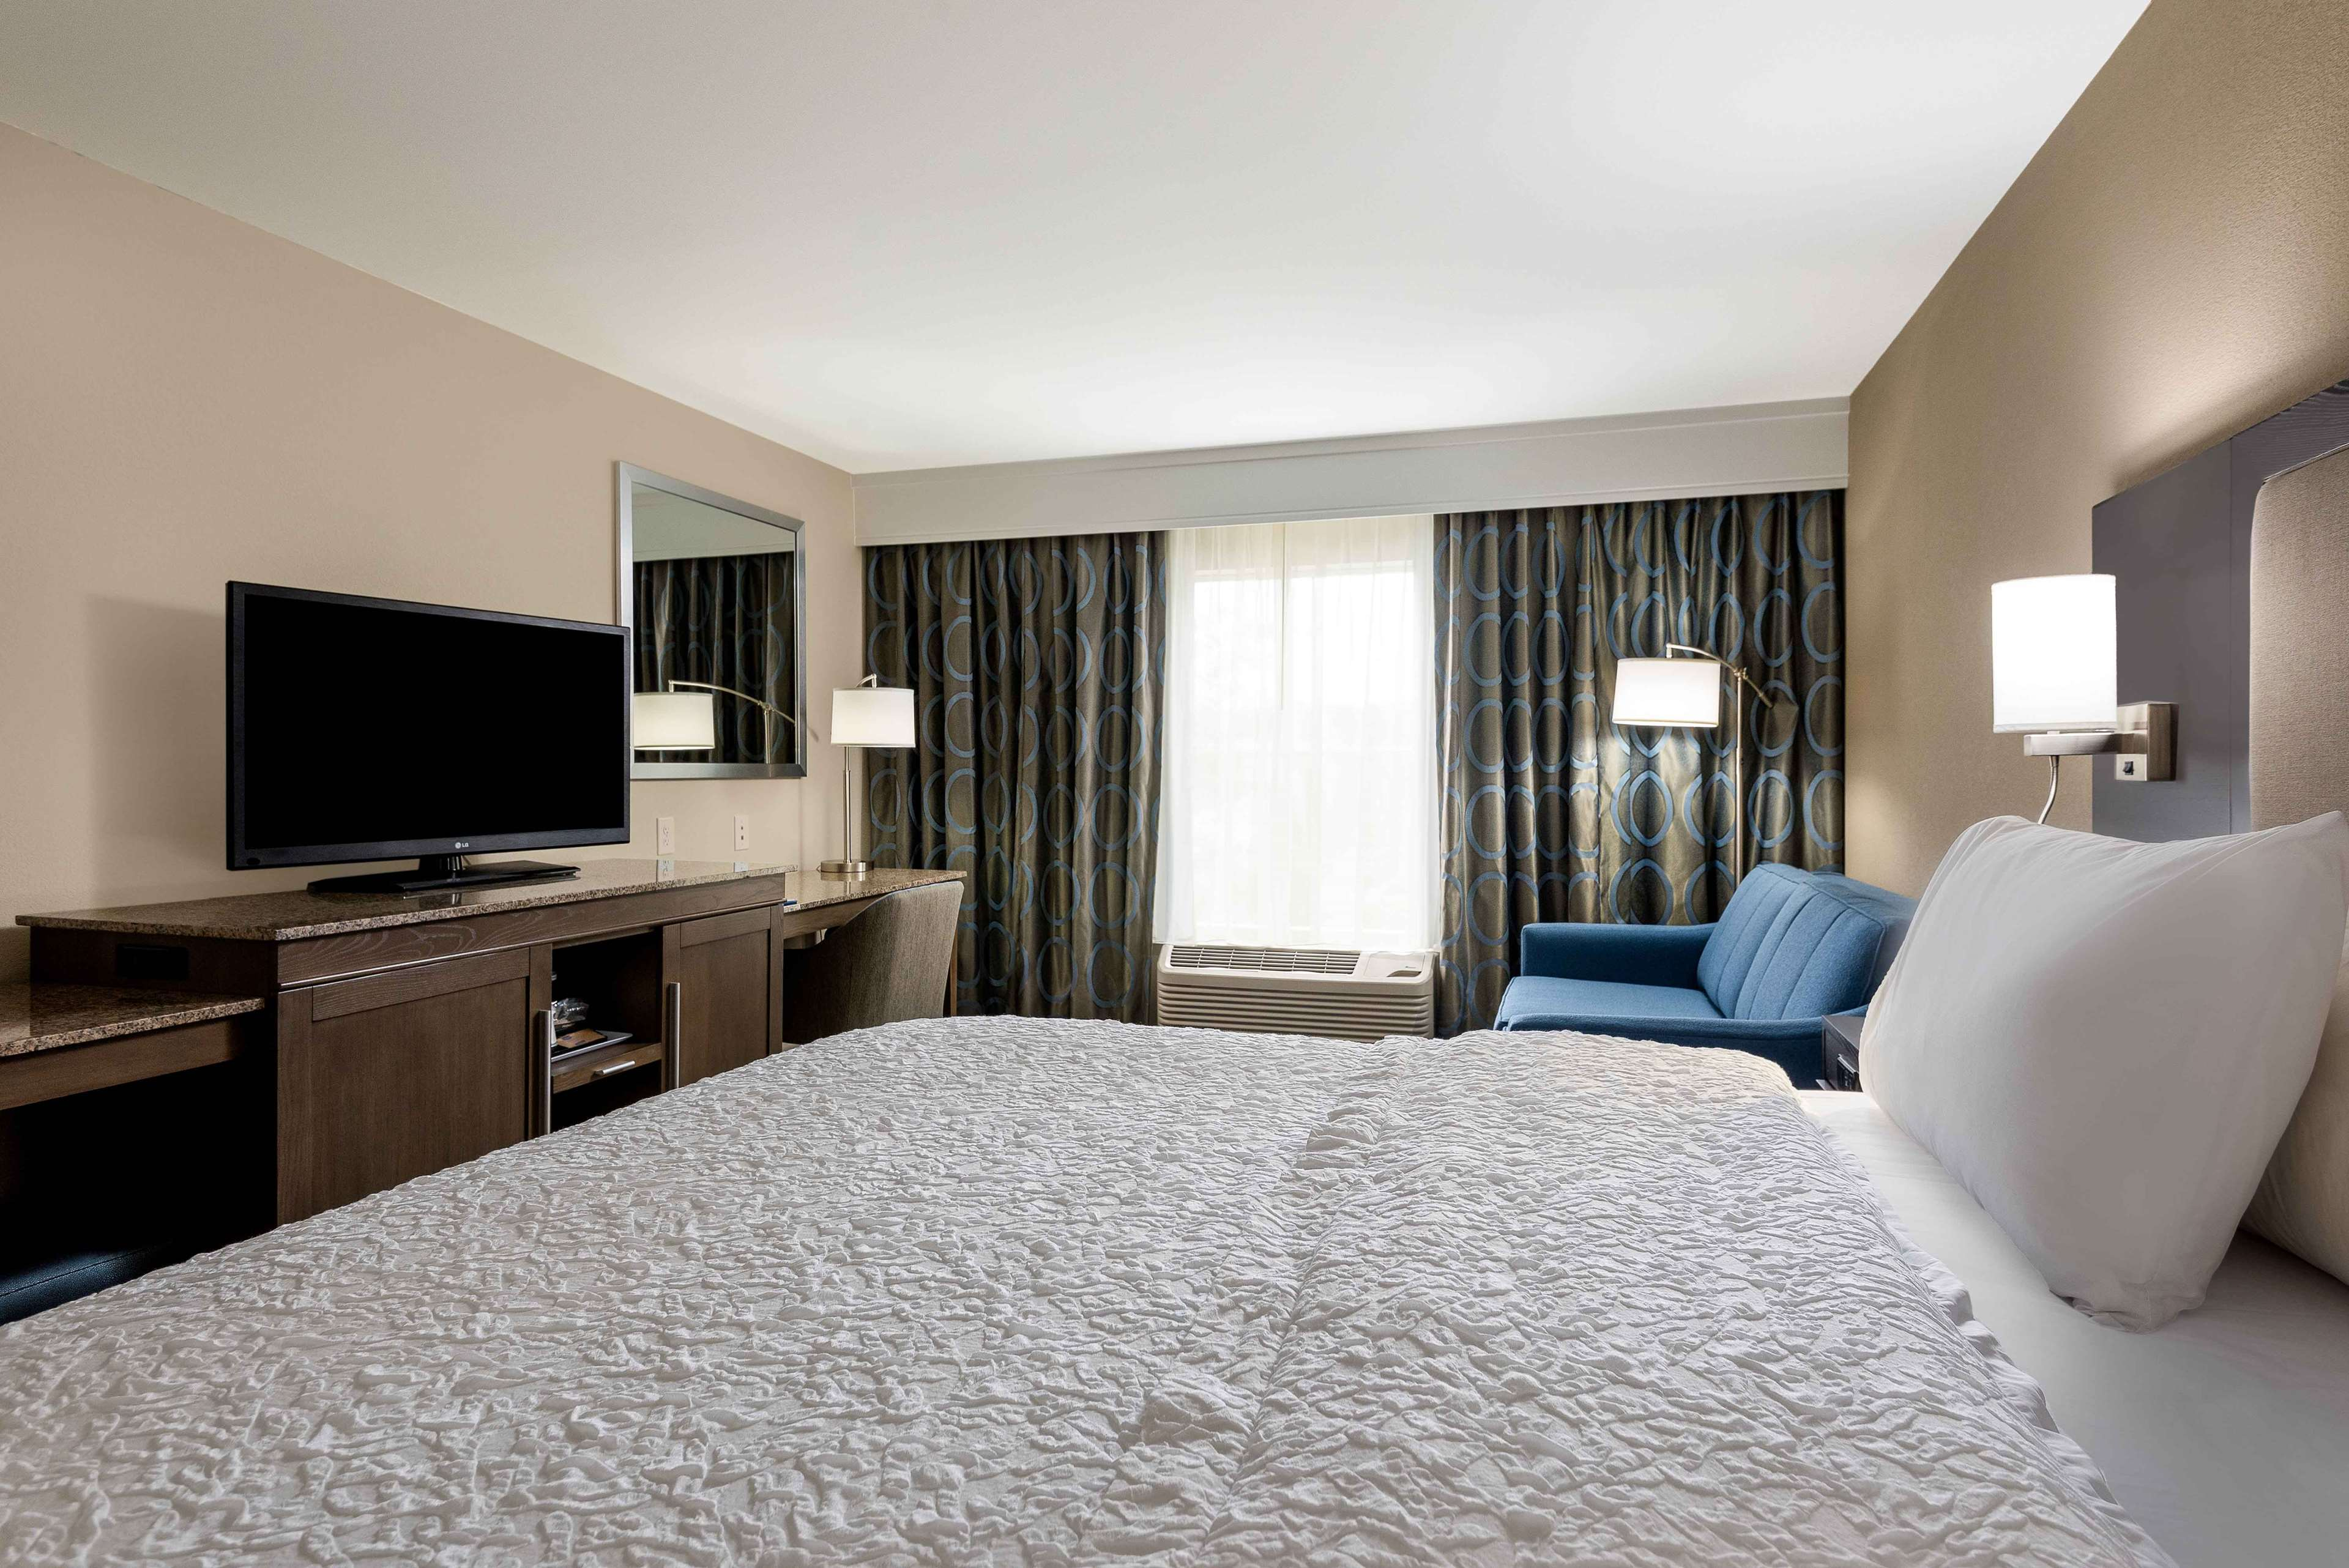 Hampton Inn & Suites Chapel Hill/Durham, Area image 13